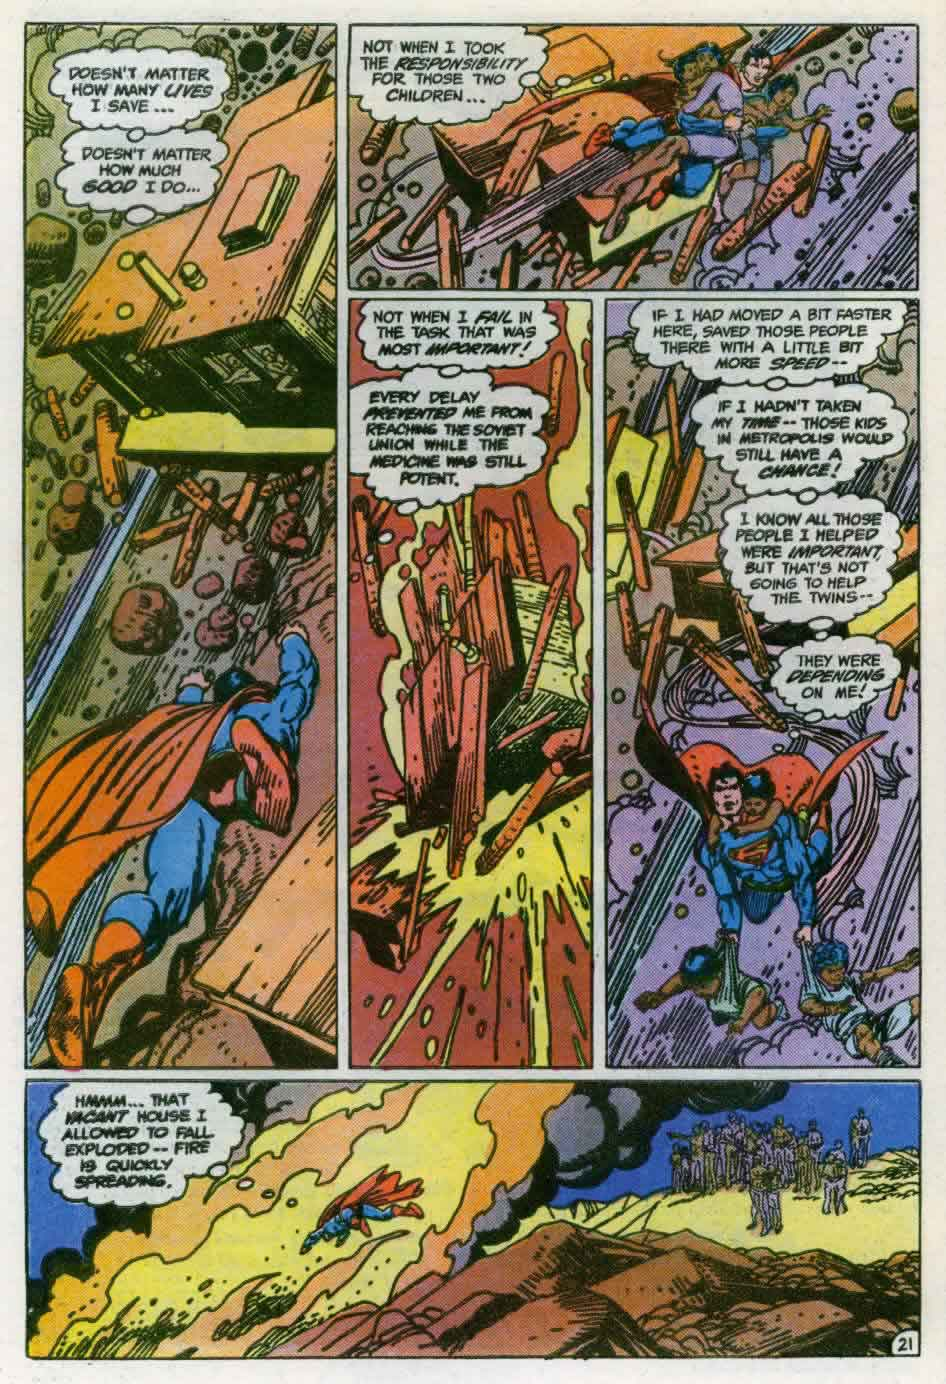 Action Comics (1938) 551 Page 21